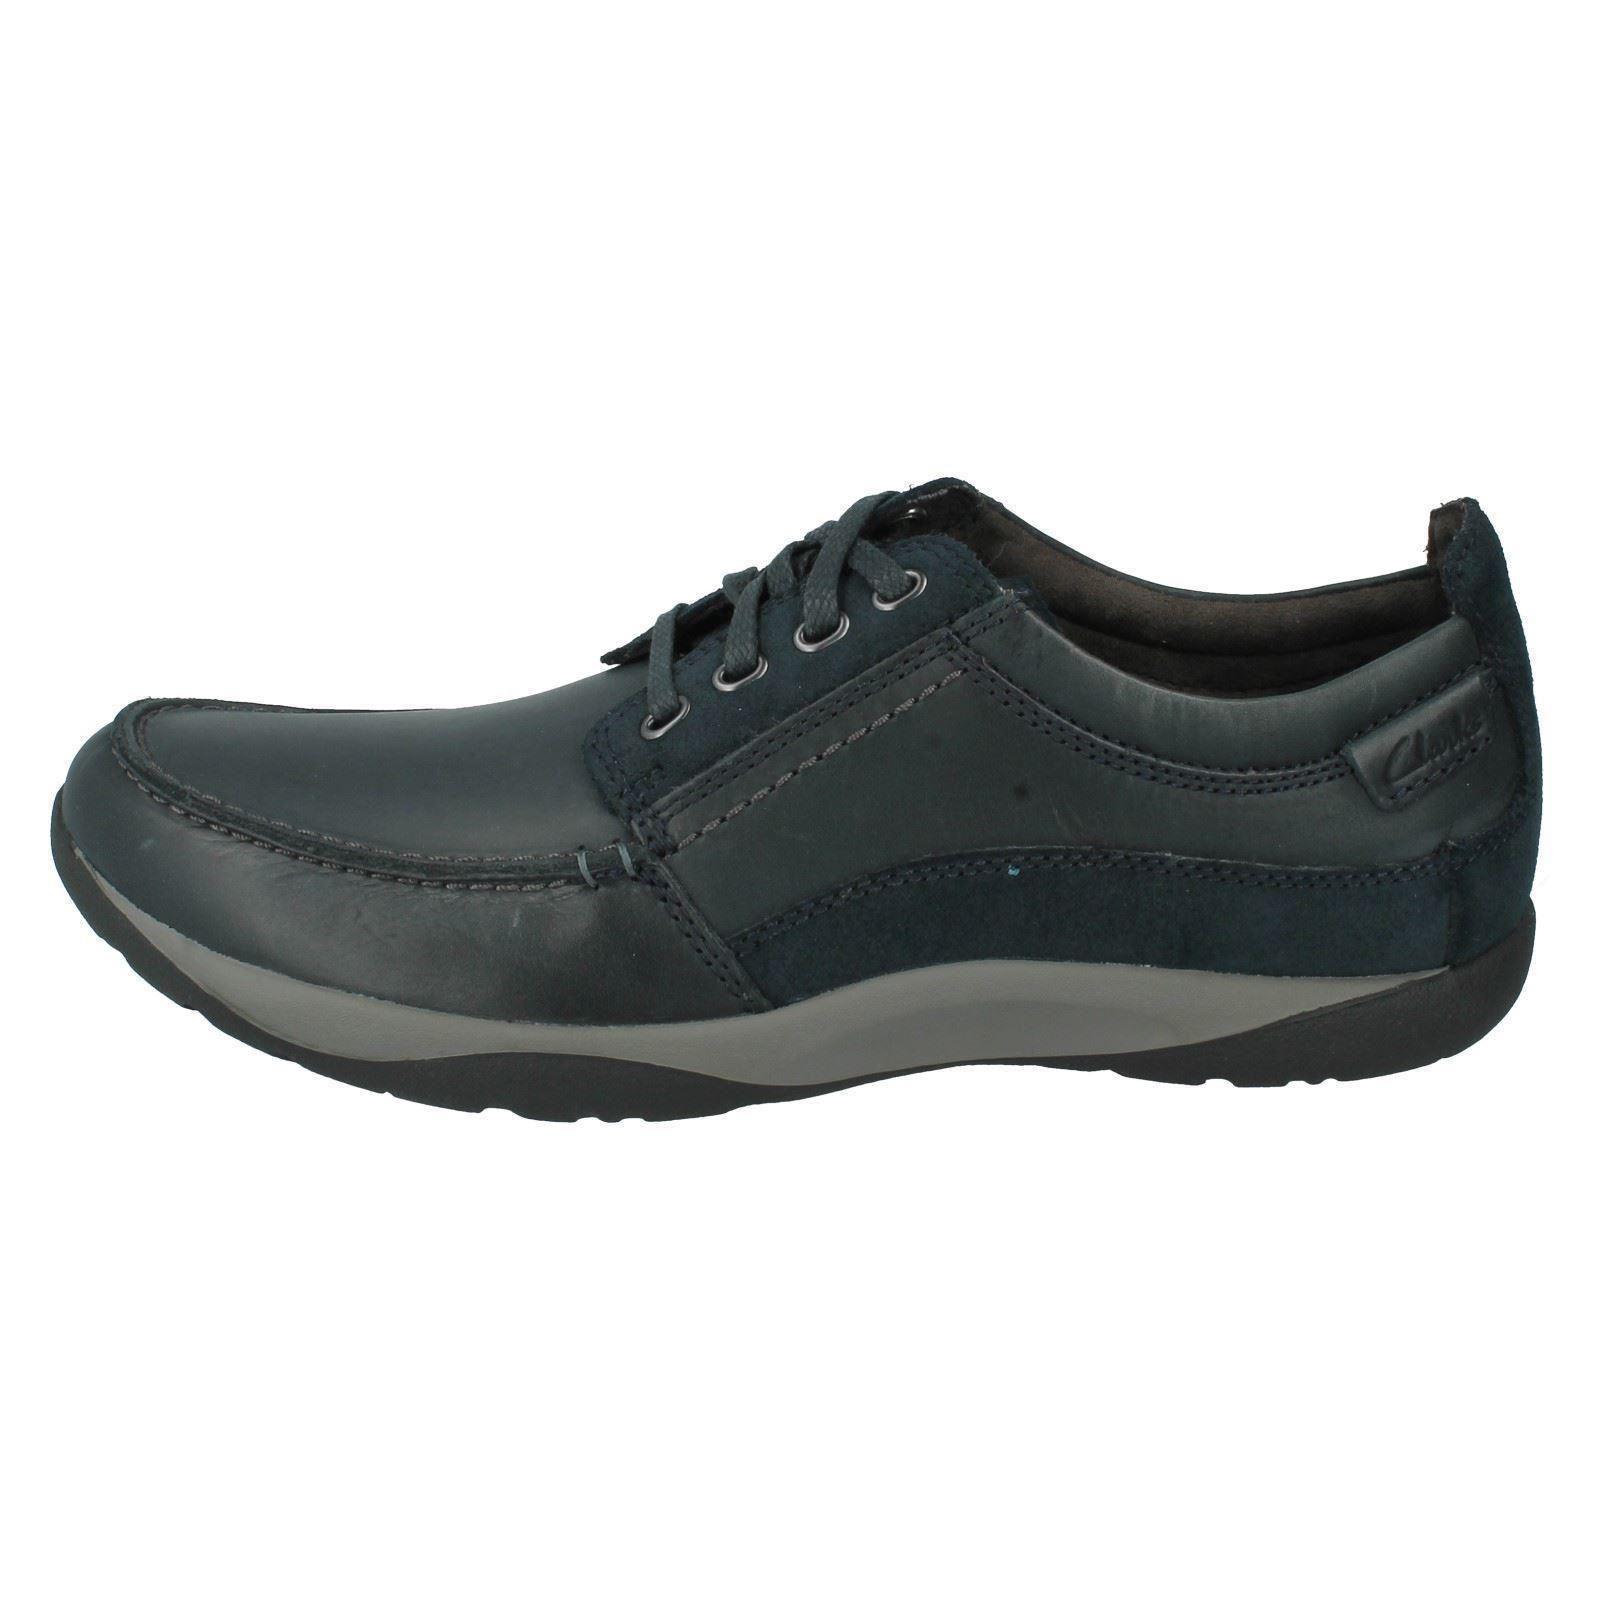 Para Hombre Clarks Zapatos Zapatos Clarks Casuales Estilo-ruta a pie 3d3440